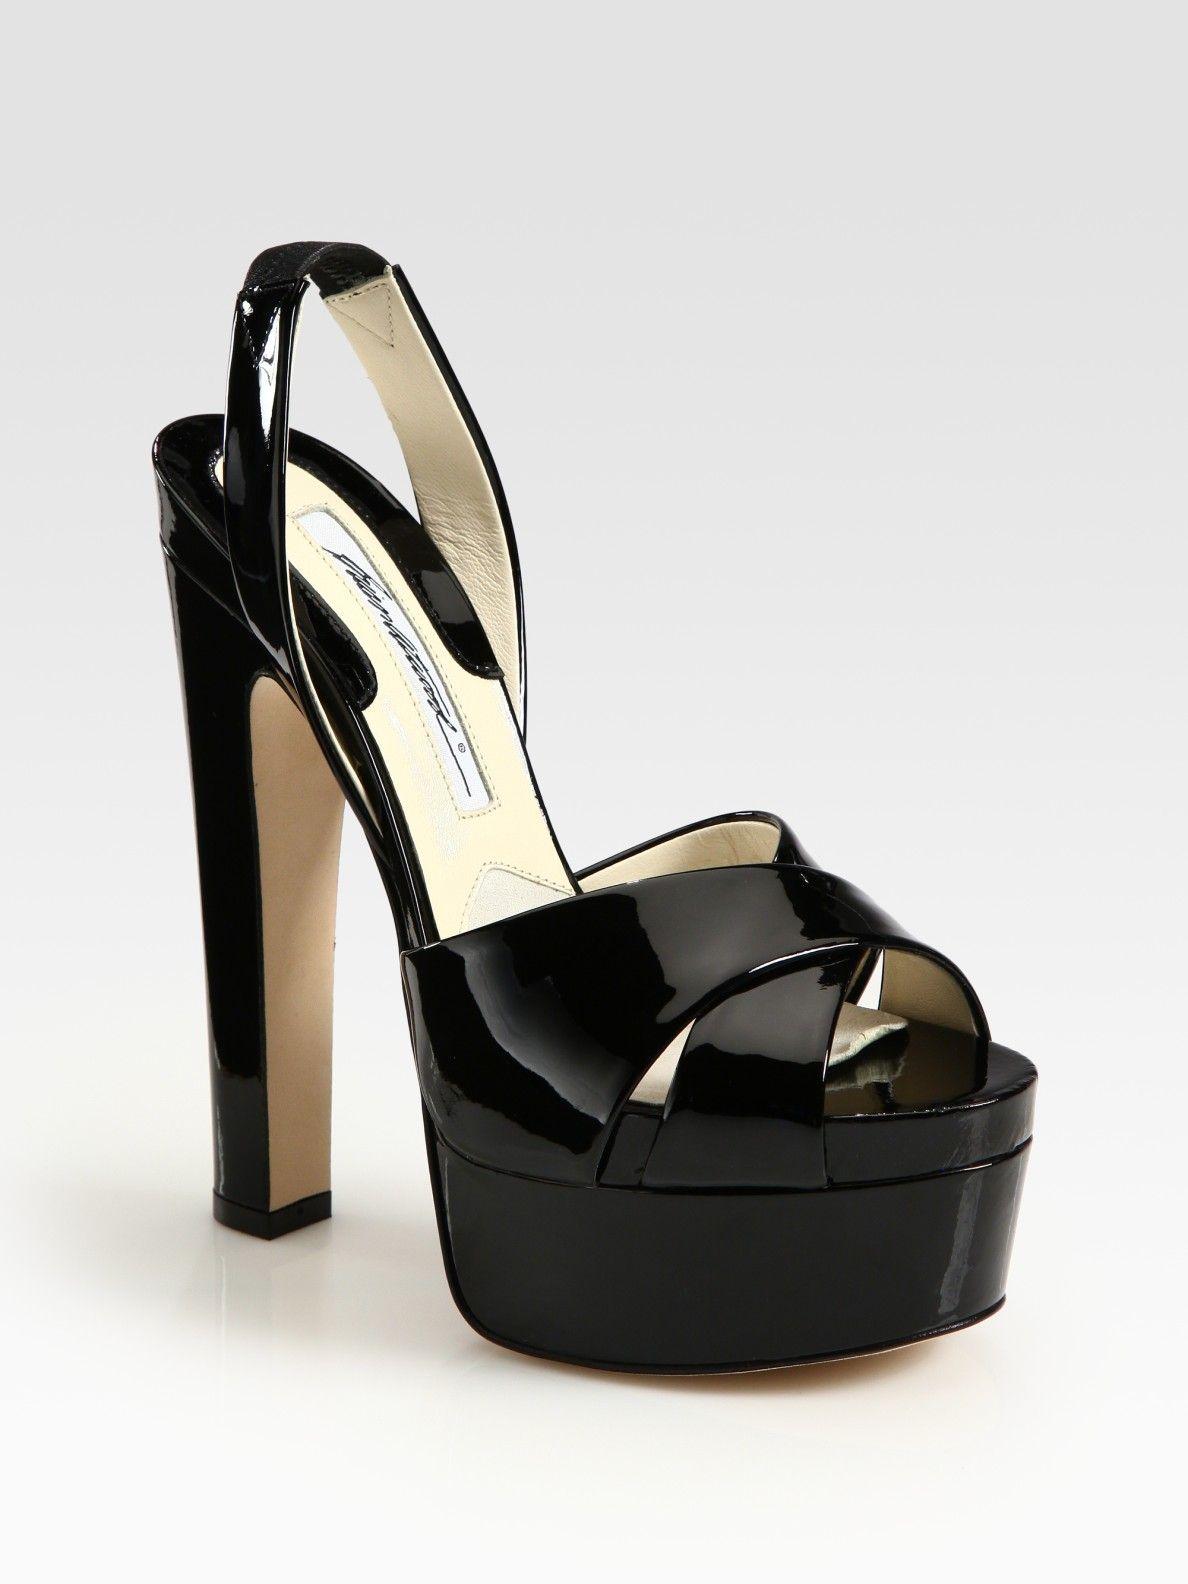 45c55143377 Brian Atwood Manhattan Patent Leather Slingback Platform Sandals in Black